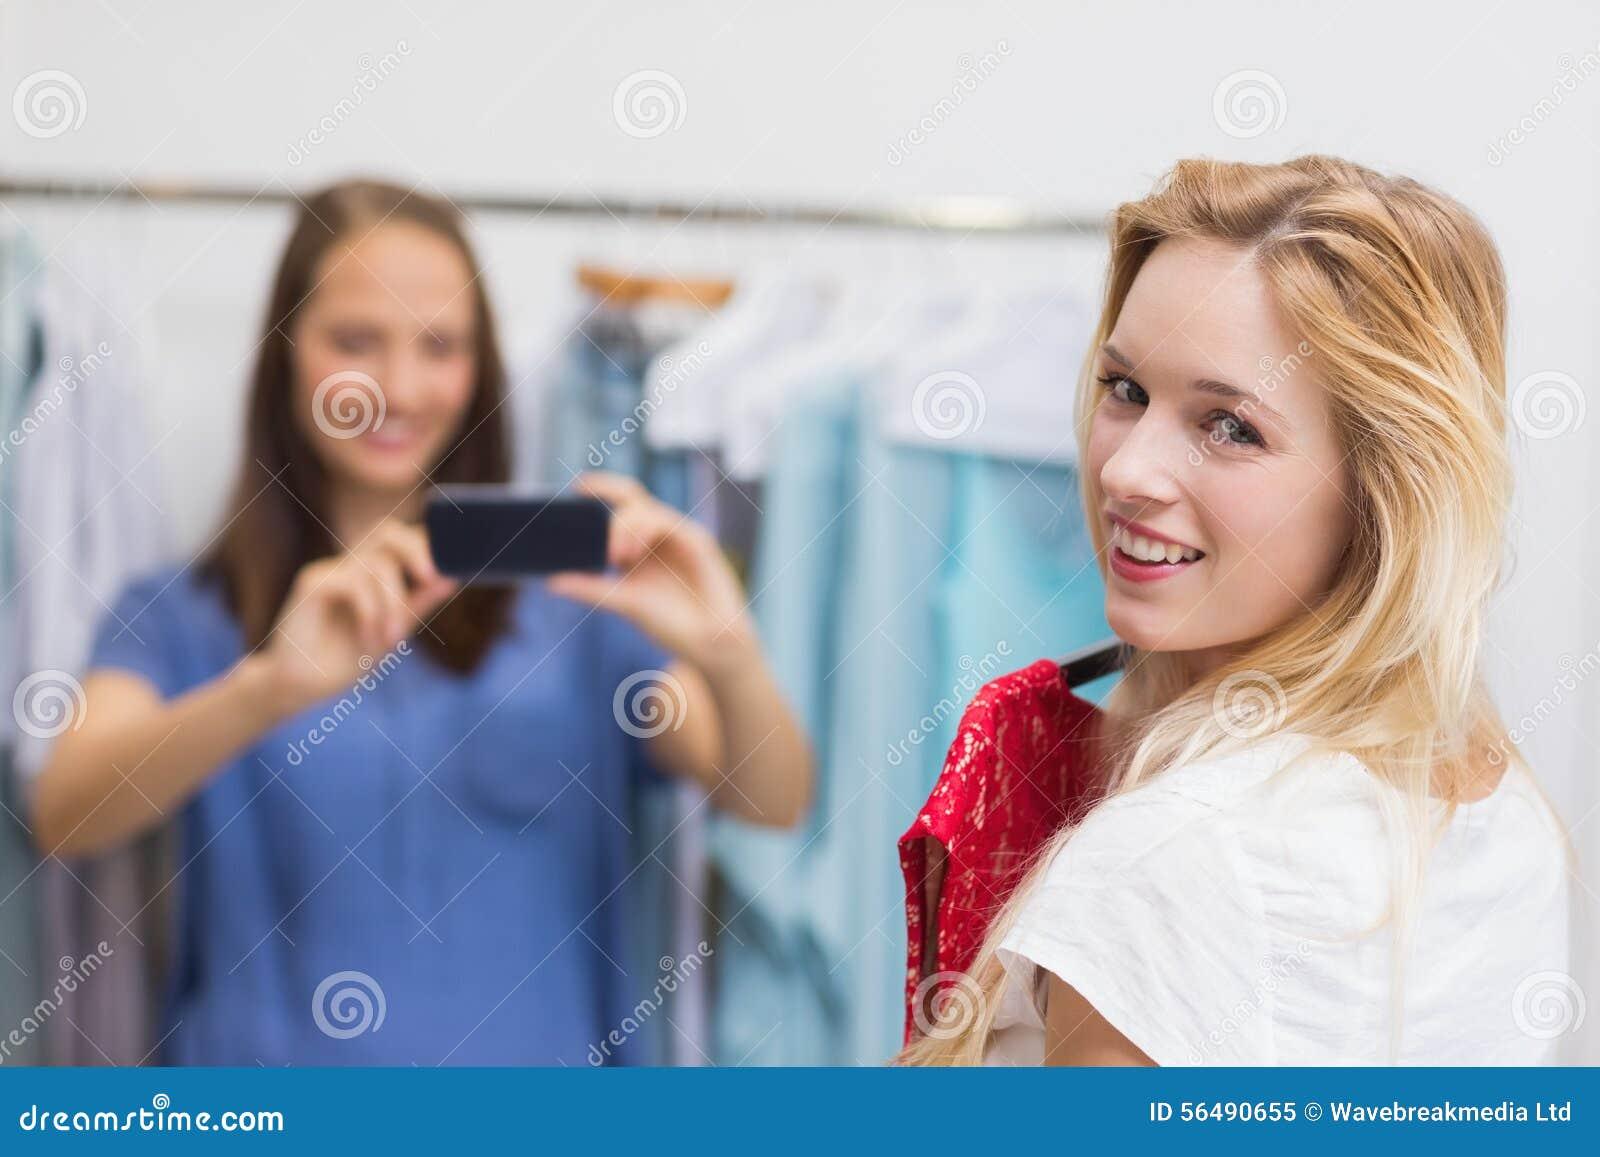 Jolie brune photographiant son ami